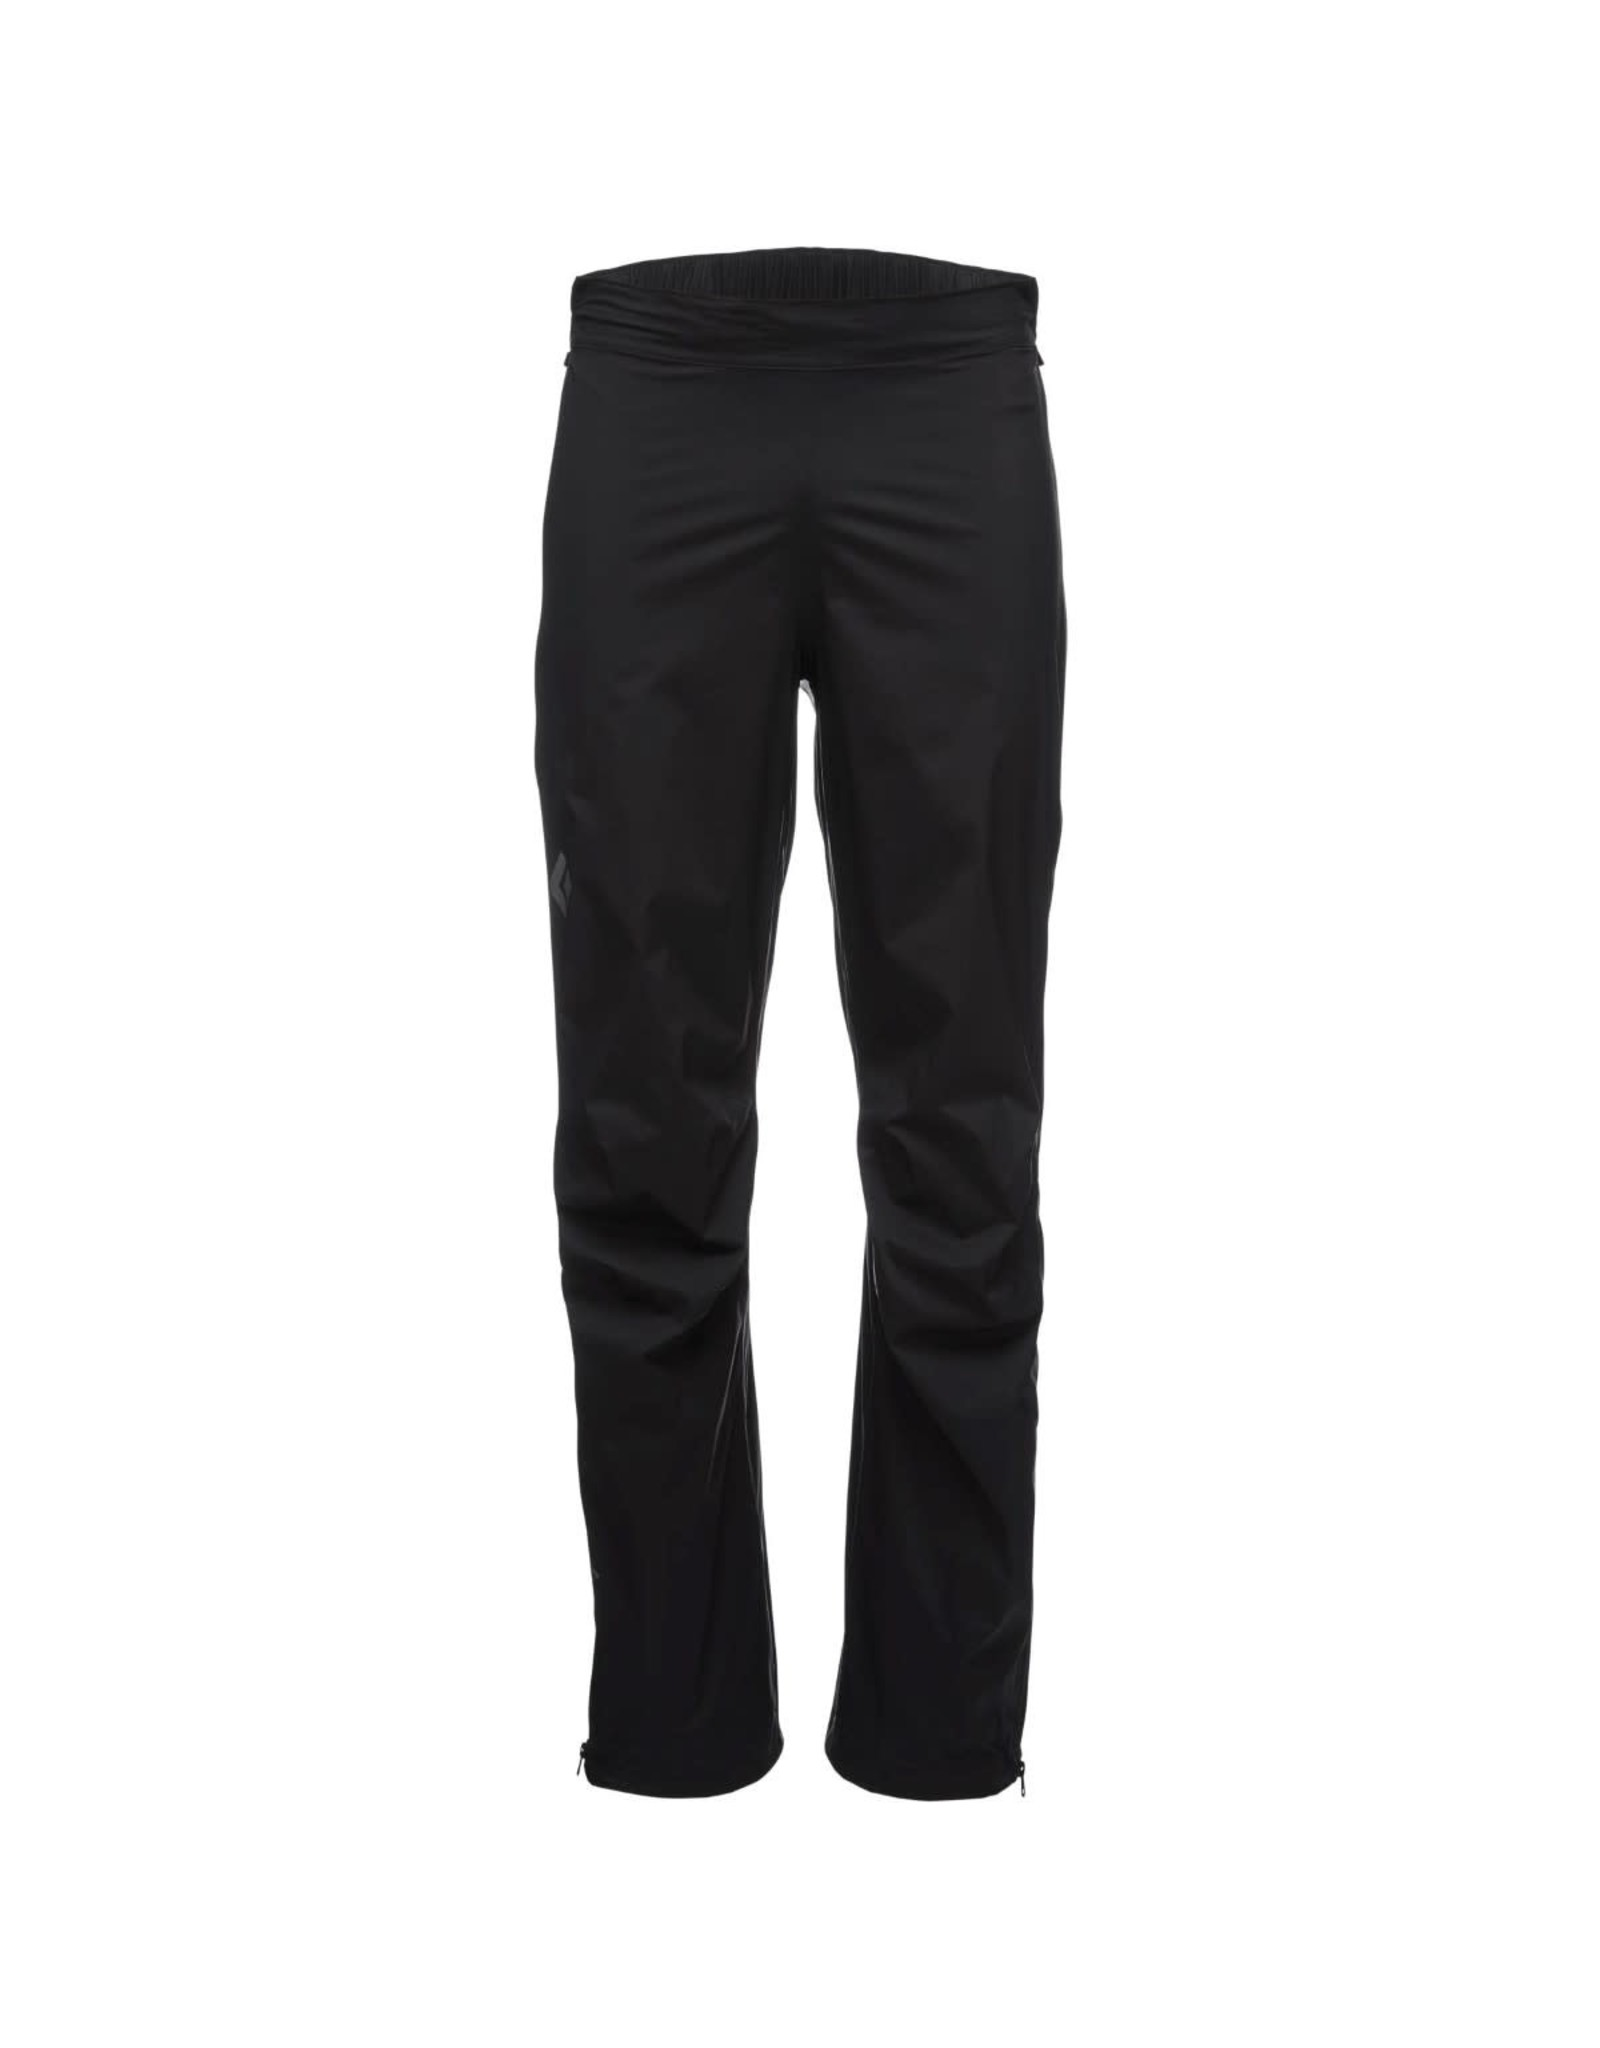 Black Diamond Black Diamond Stormline Pant Full Zip